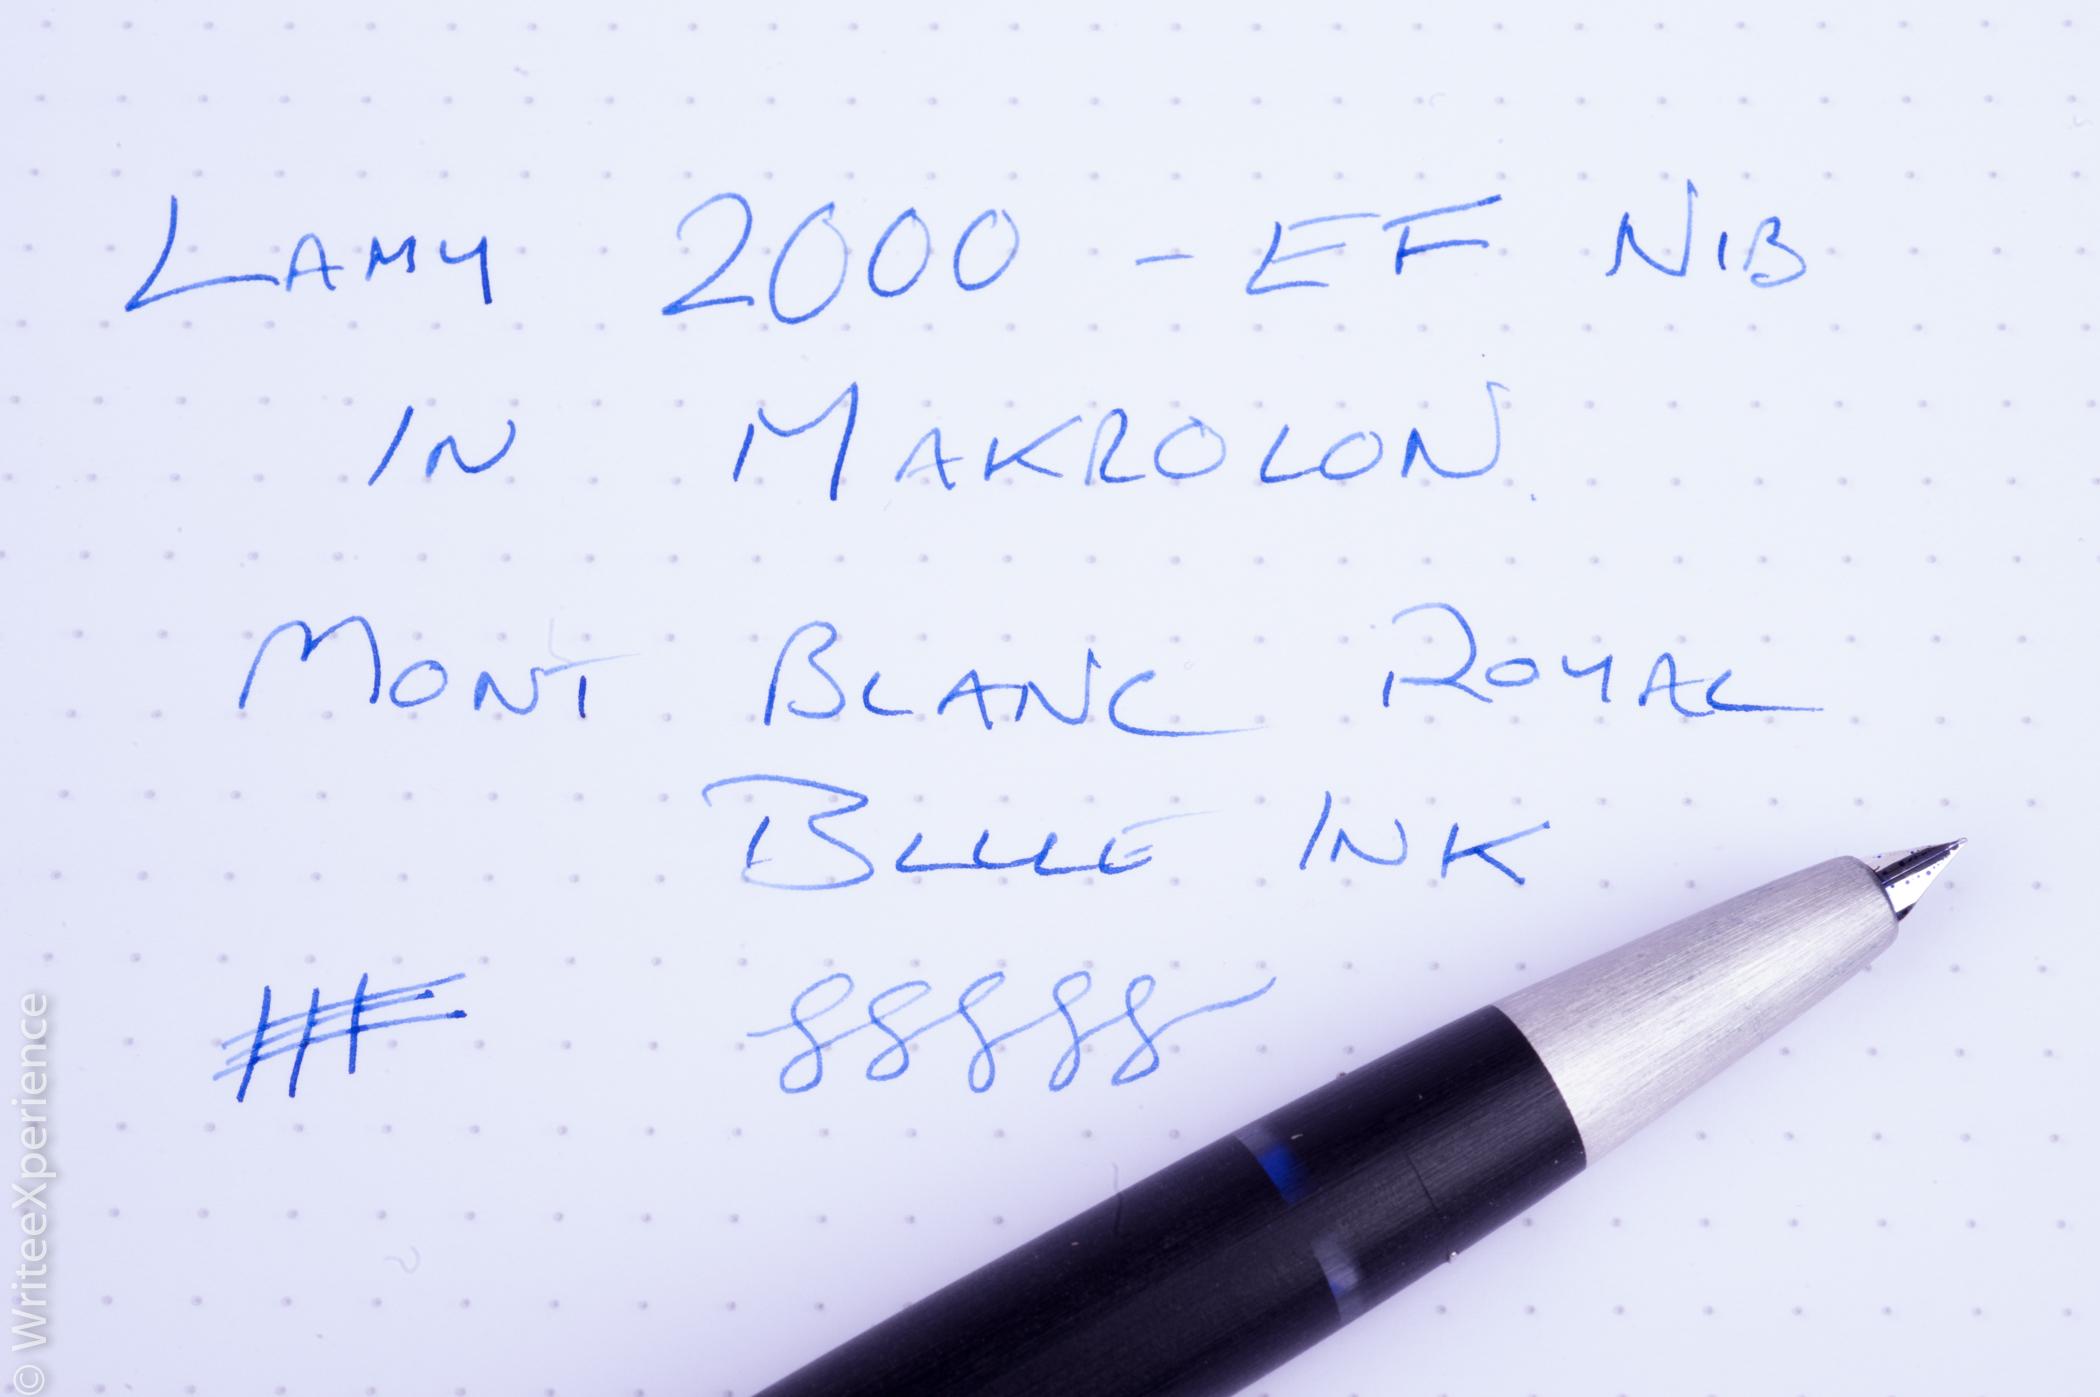 Lamy 2000 writing sample montblanc royal blue